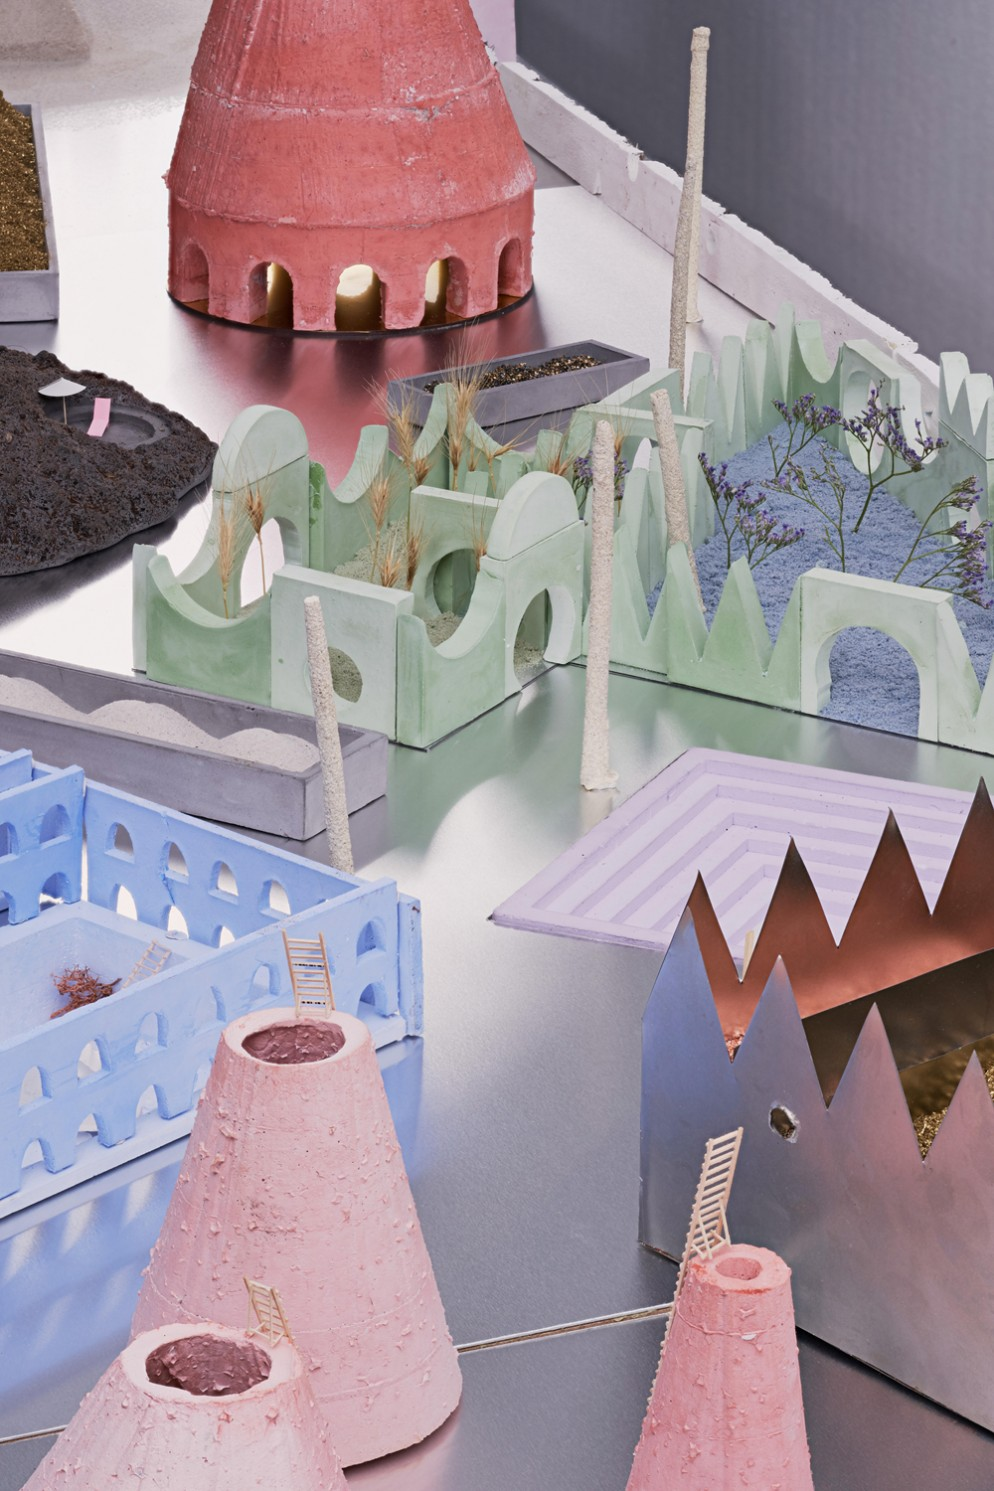 web-34.-Studio-Ossidiana_Amsterdam-Allegories-©-Studio-Ossidiana